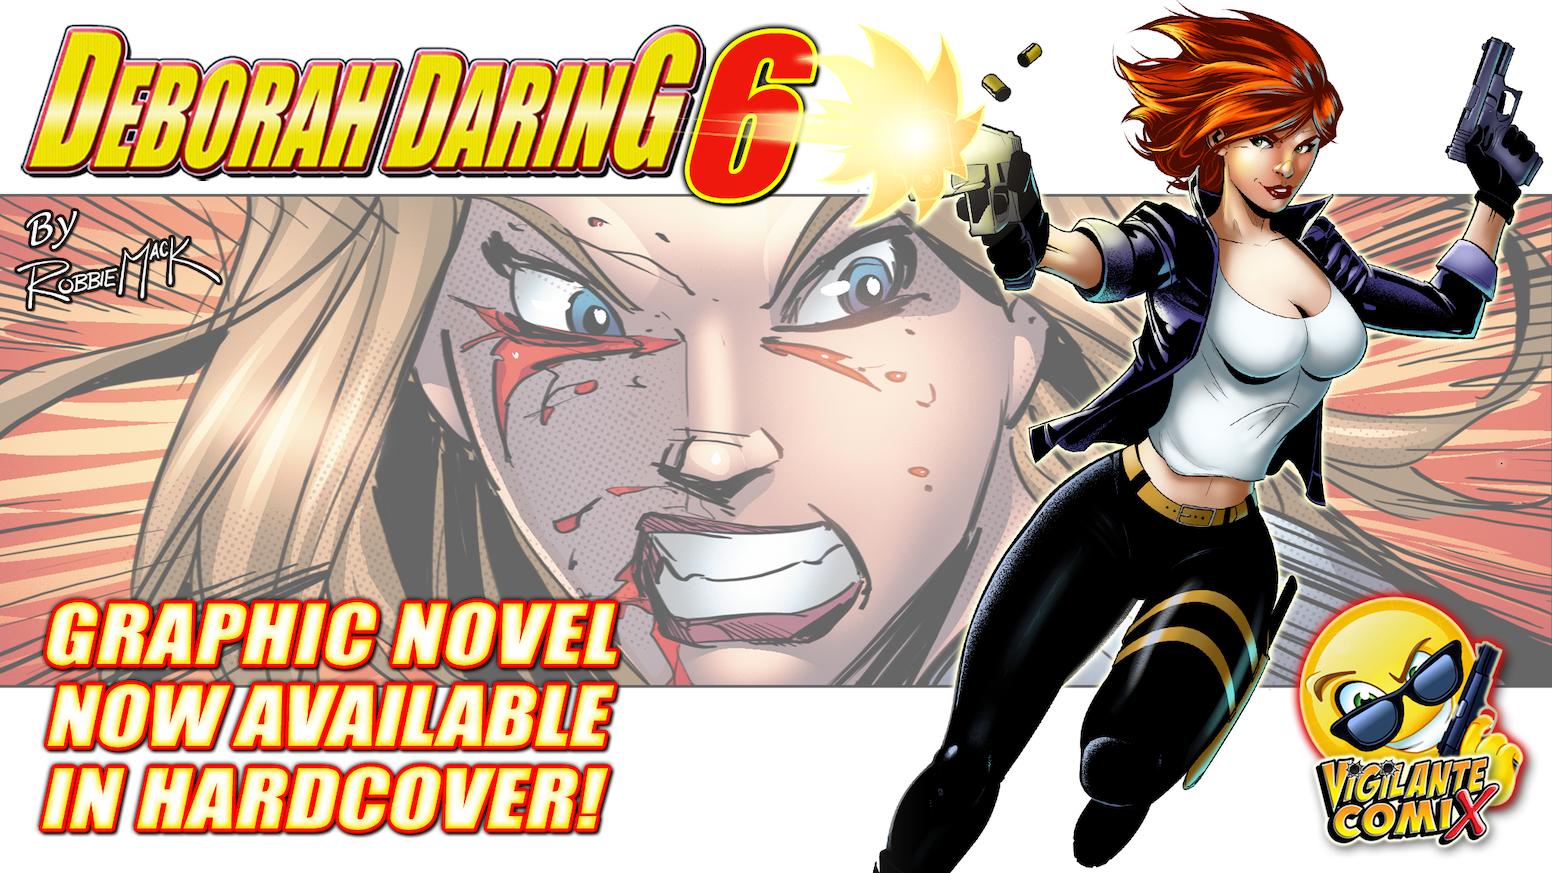 The exciting conclusion to the 6-part Deborah Daring Detective series from Vigilante Comix. By Robbie Mack, Jae Korim & Dennis Lehmann. Pre-Order Store Coming Soon!